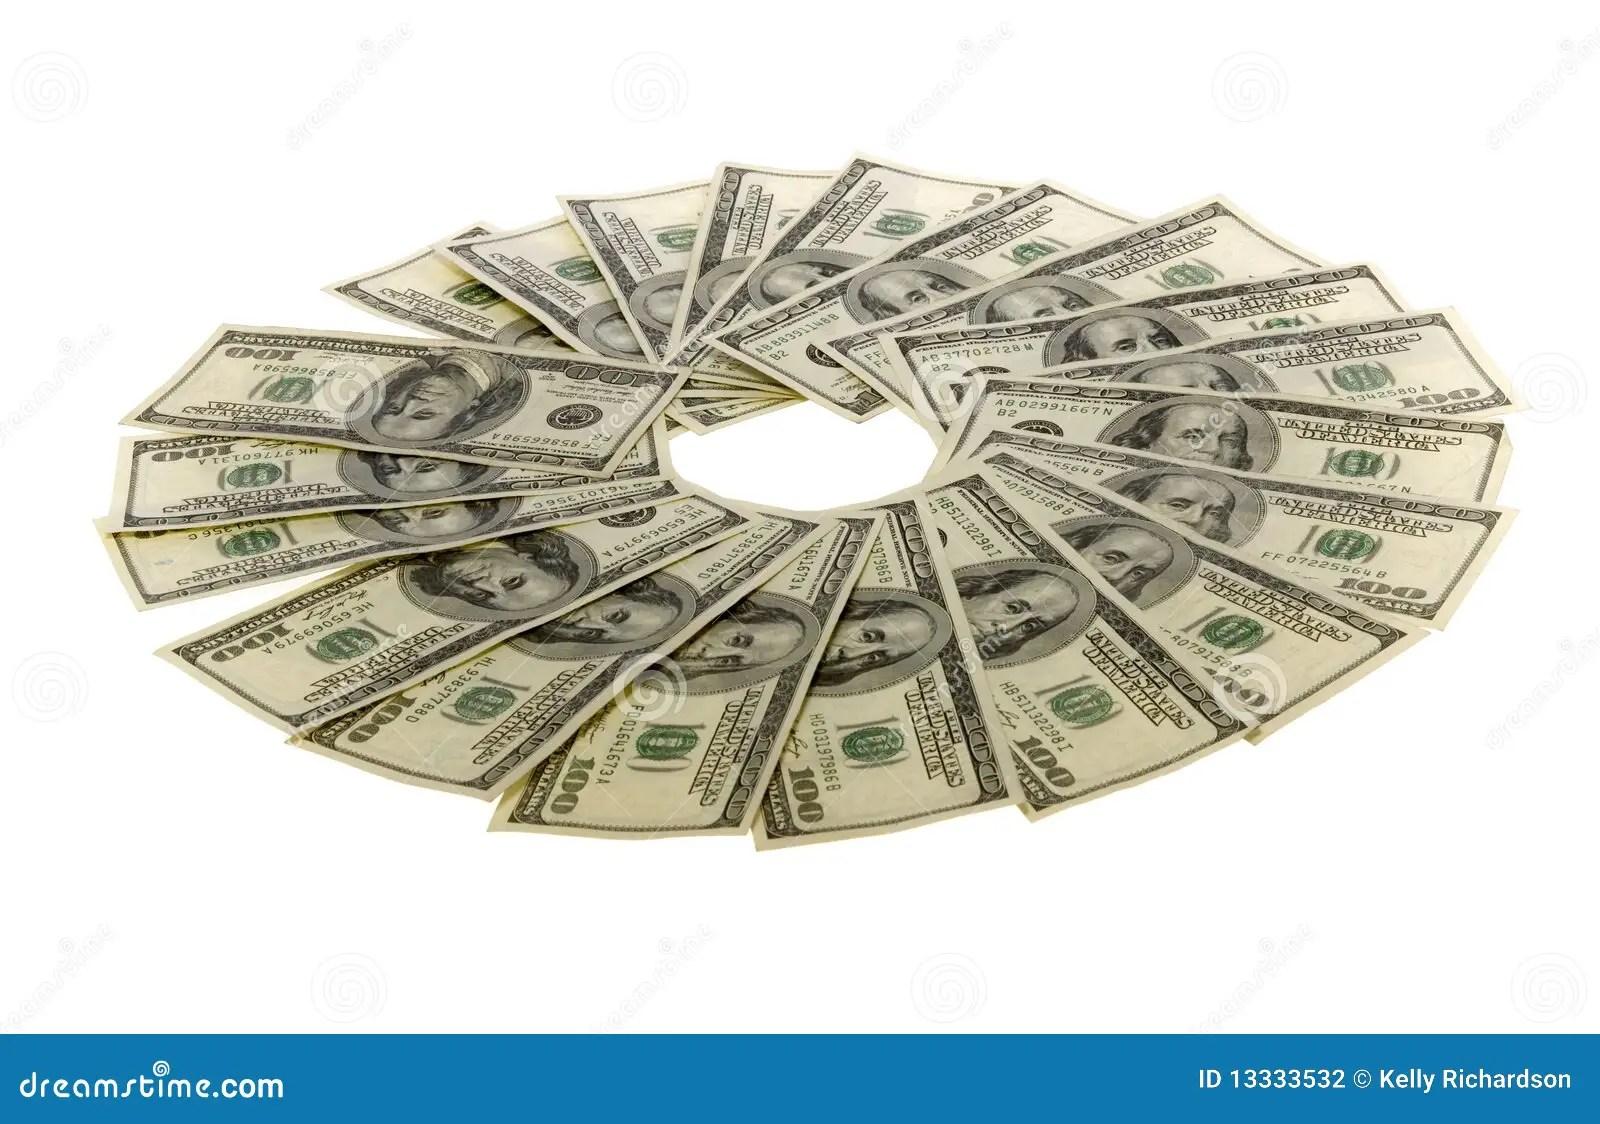 10 Thousand Dollar Bill